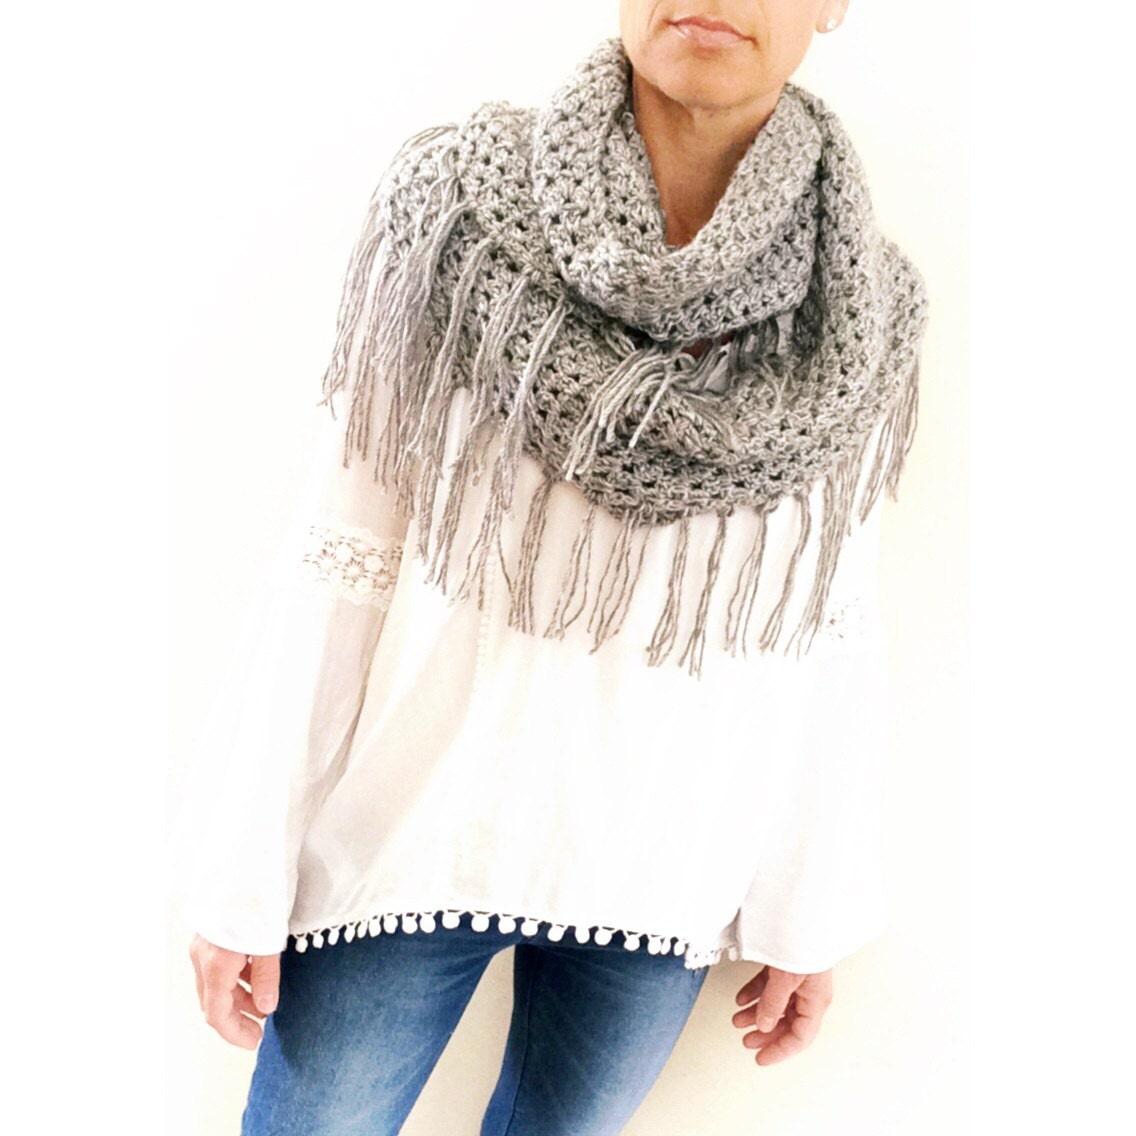 Crochet Scarf Pattern The Alta Fringe Loop Scarf Crochet Etsy